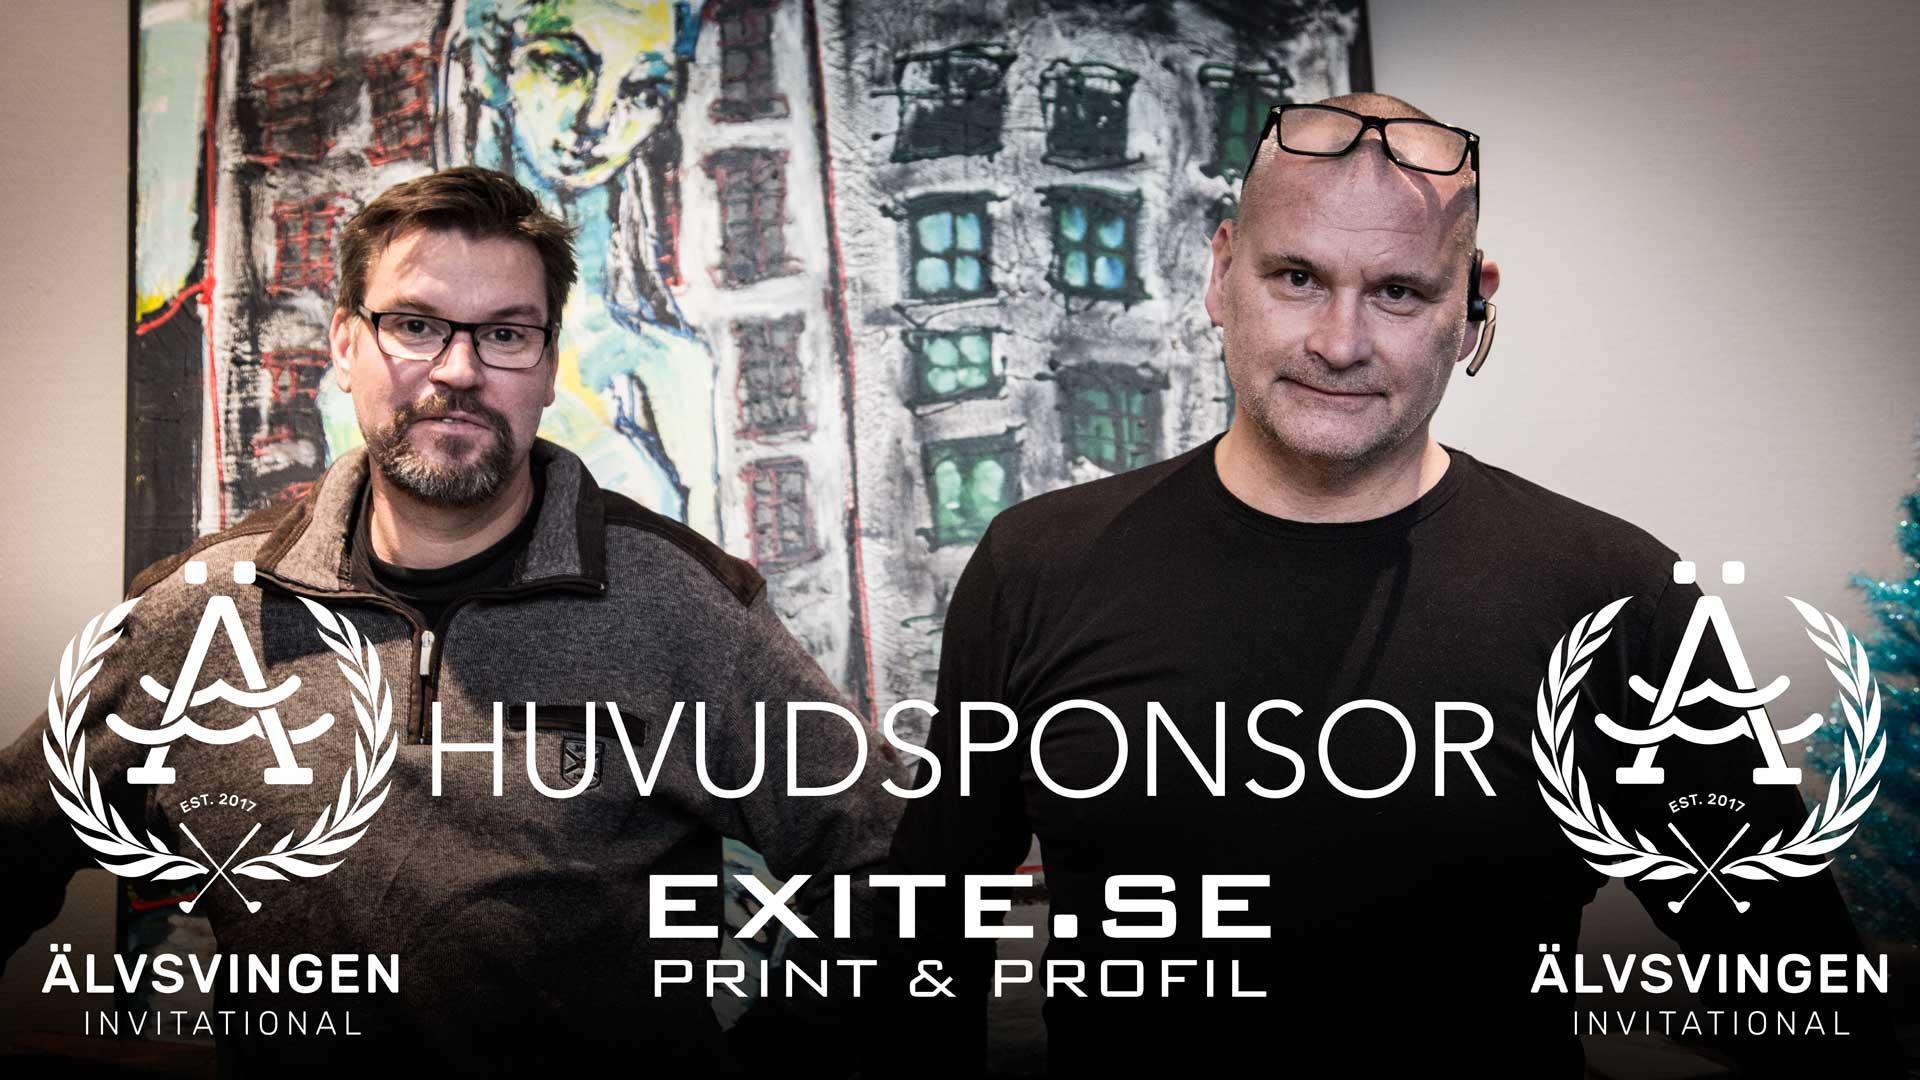 Exite Print & Profil går in som Huvudsponsorer i Älvsvingen Invitational 2018